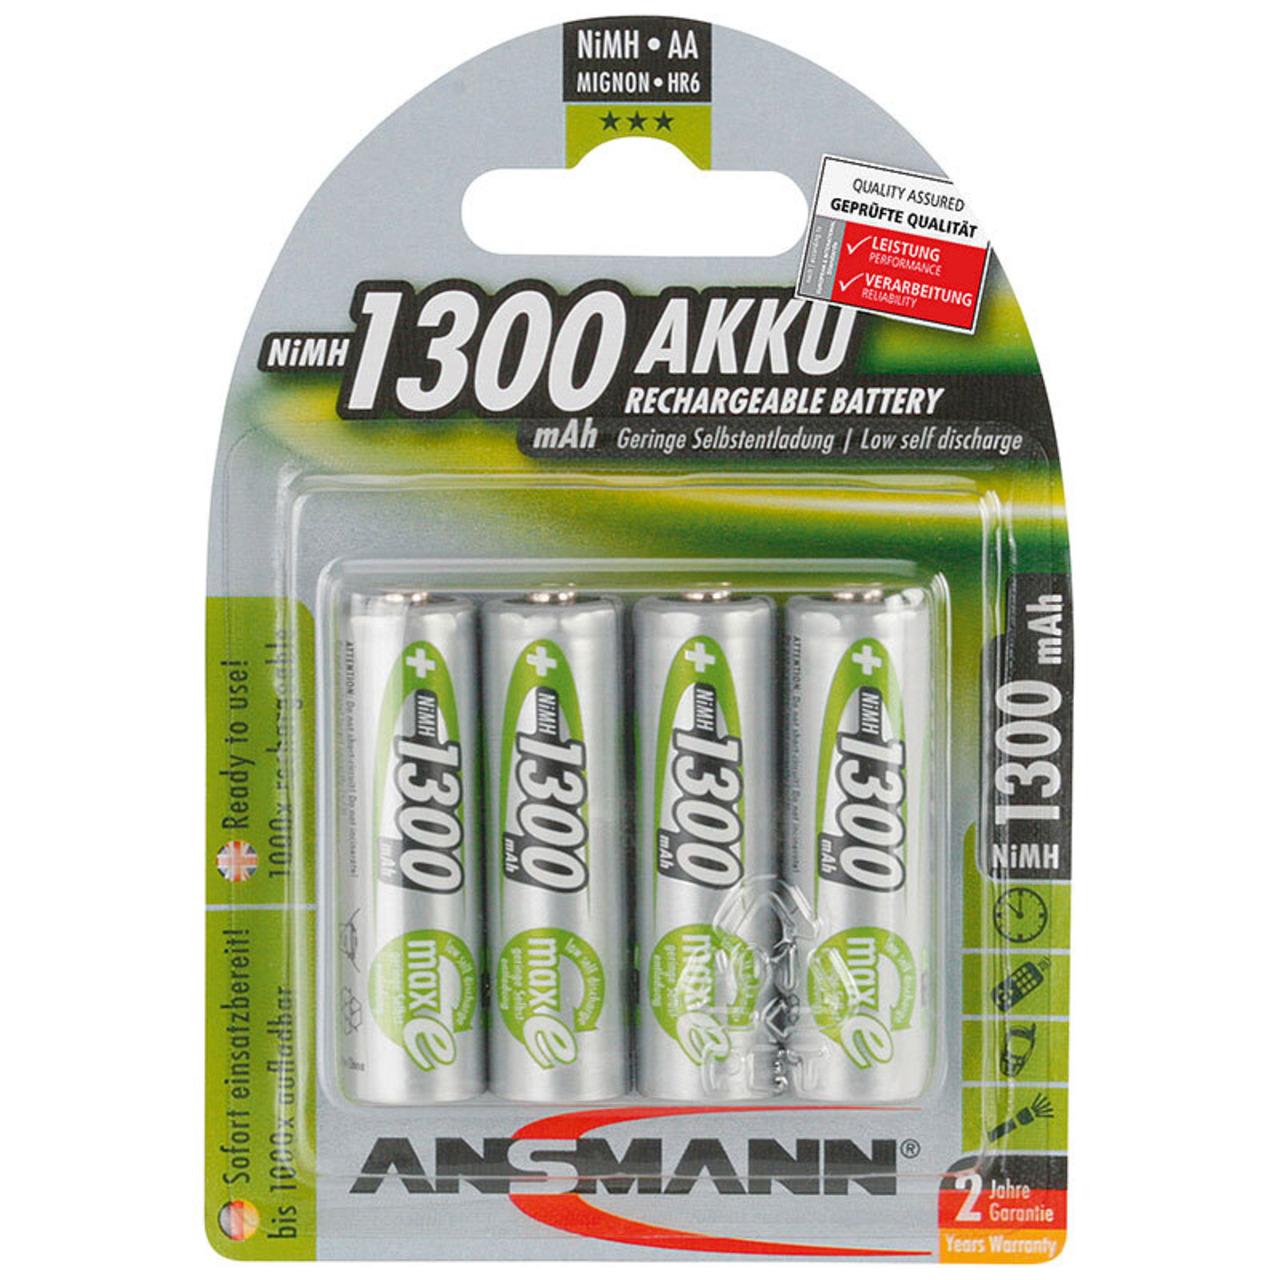 Ansmann NiMH Akku maxE- ready2use Mignon AA 1300mAh- R6 4er Pack